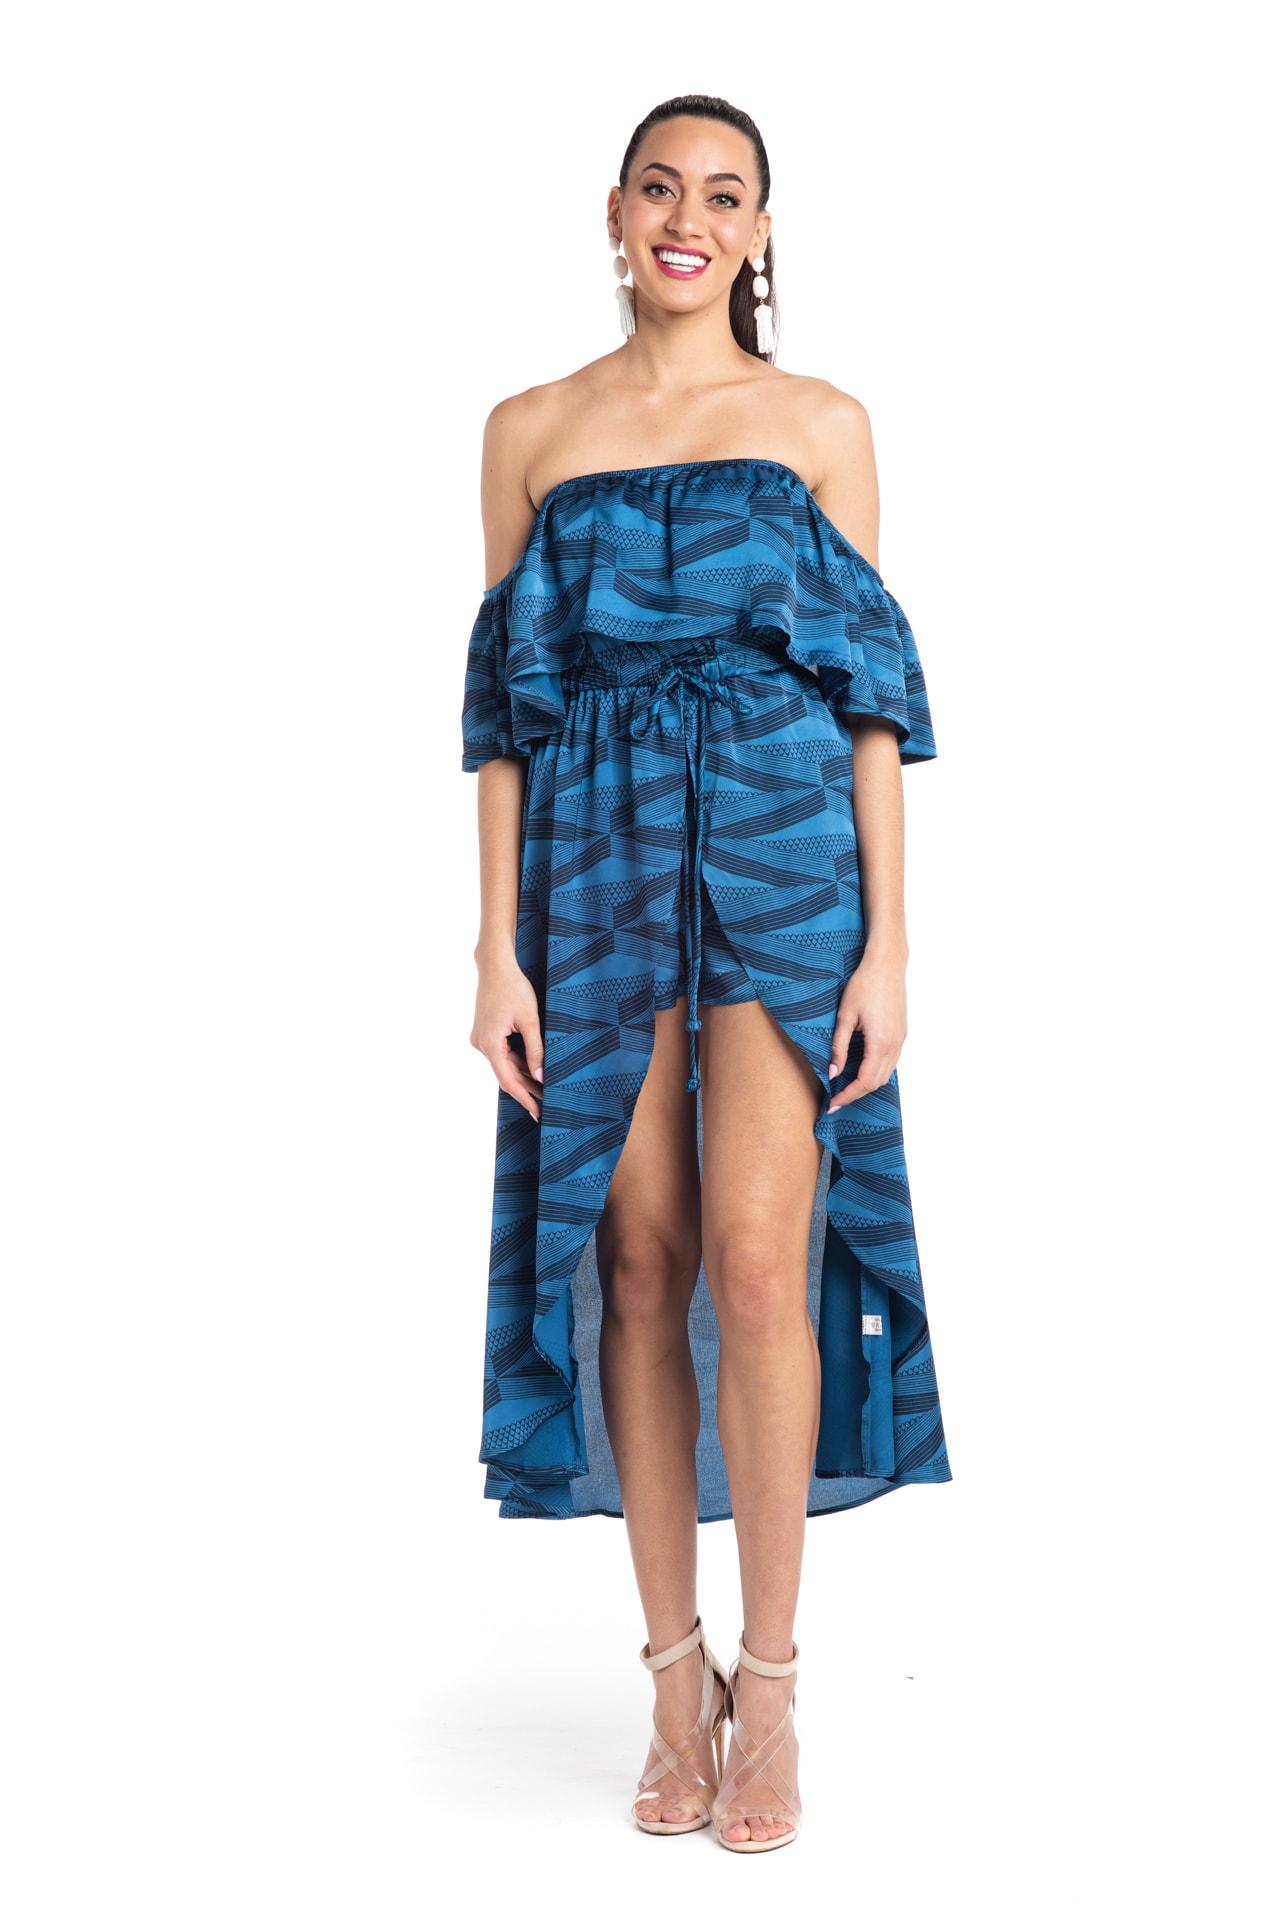 Model wearing Venus Dress in Blue - Front View